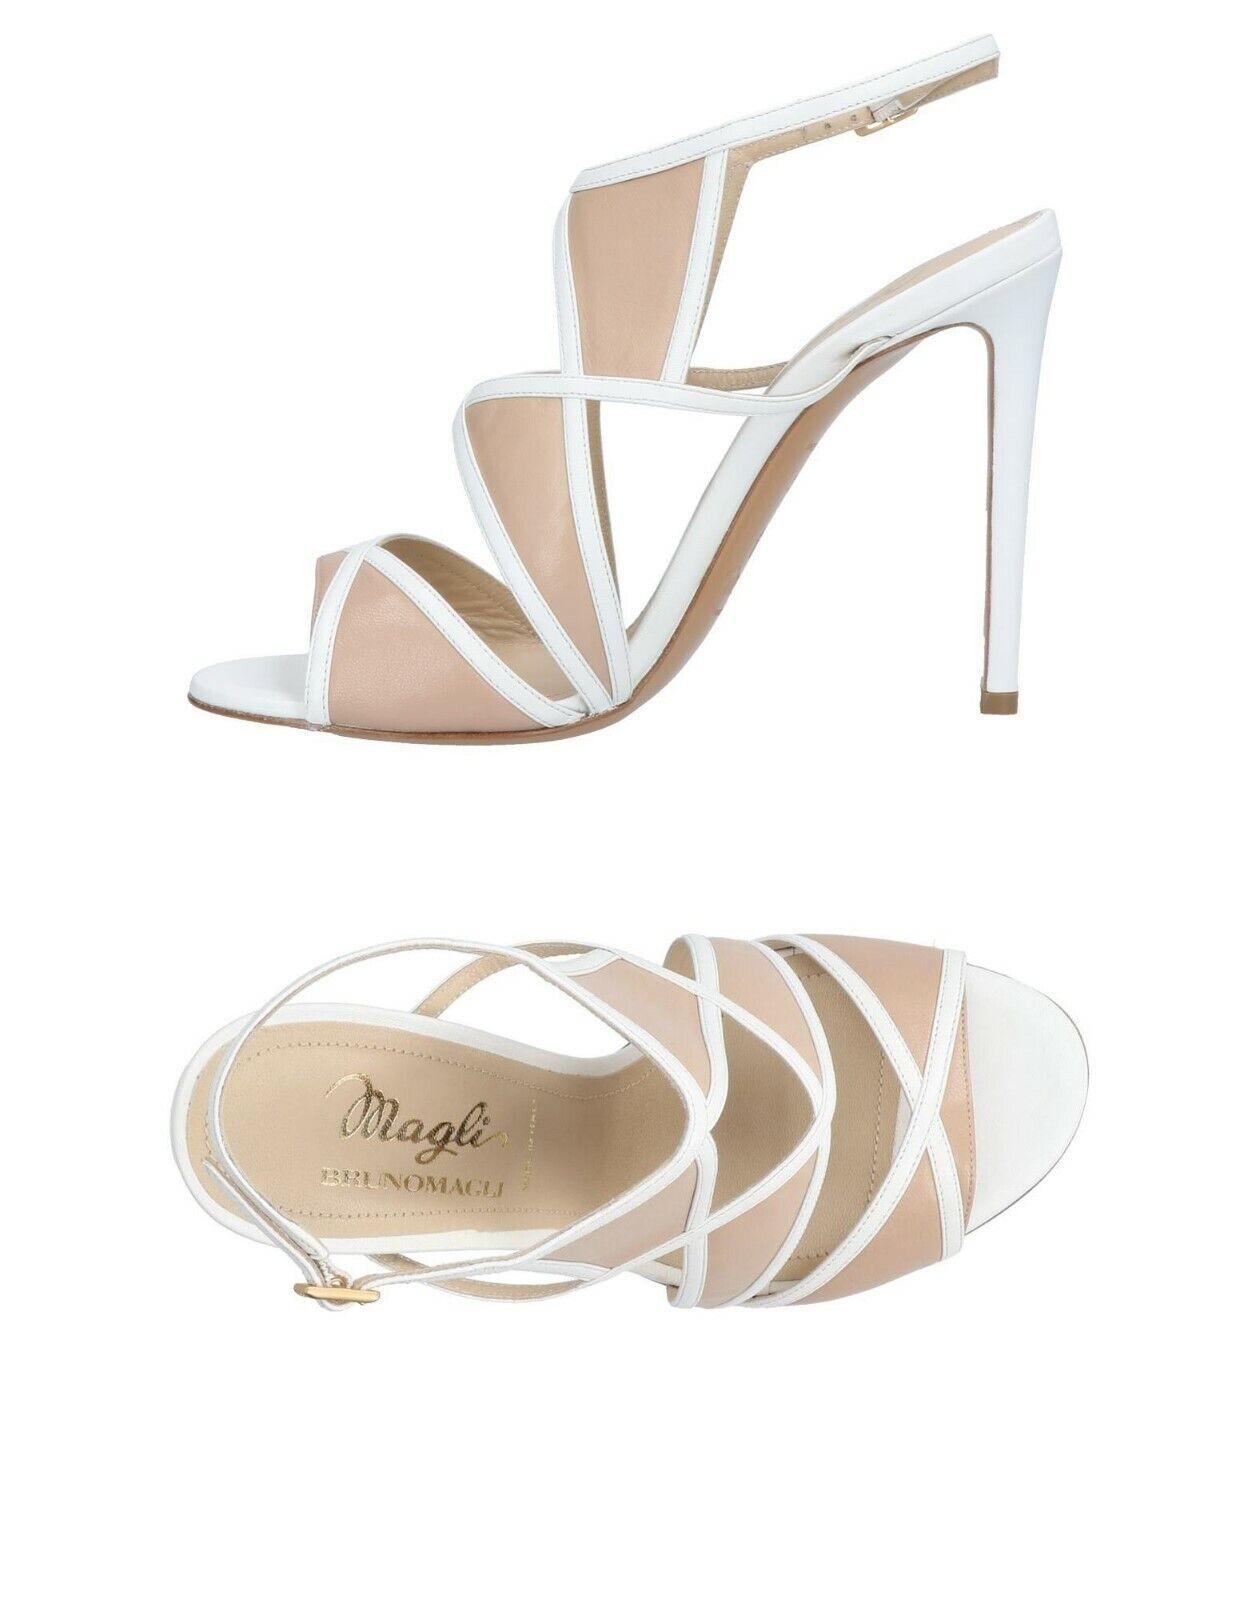 NWB   450.00 Magli Bruno Nude bianca Cutout Sandal Sz.36.5 US.6.5  Felice shopping